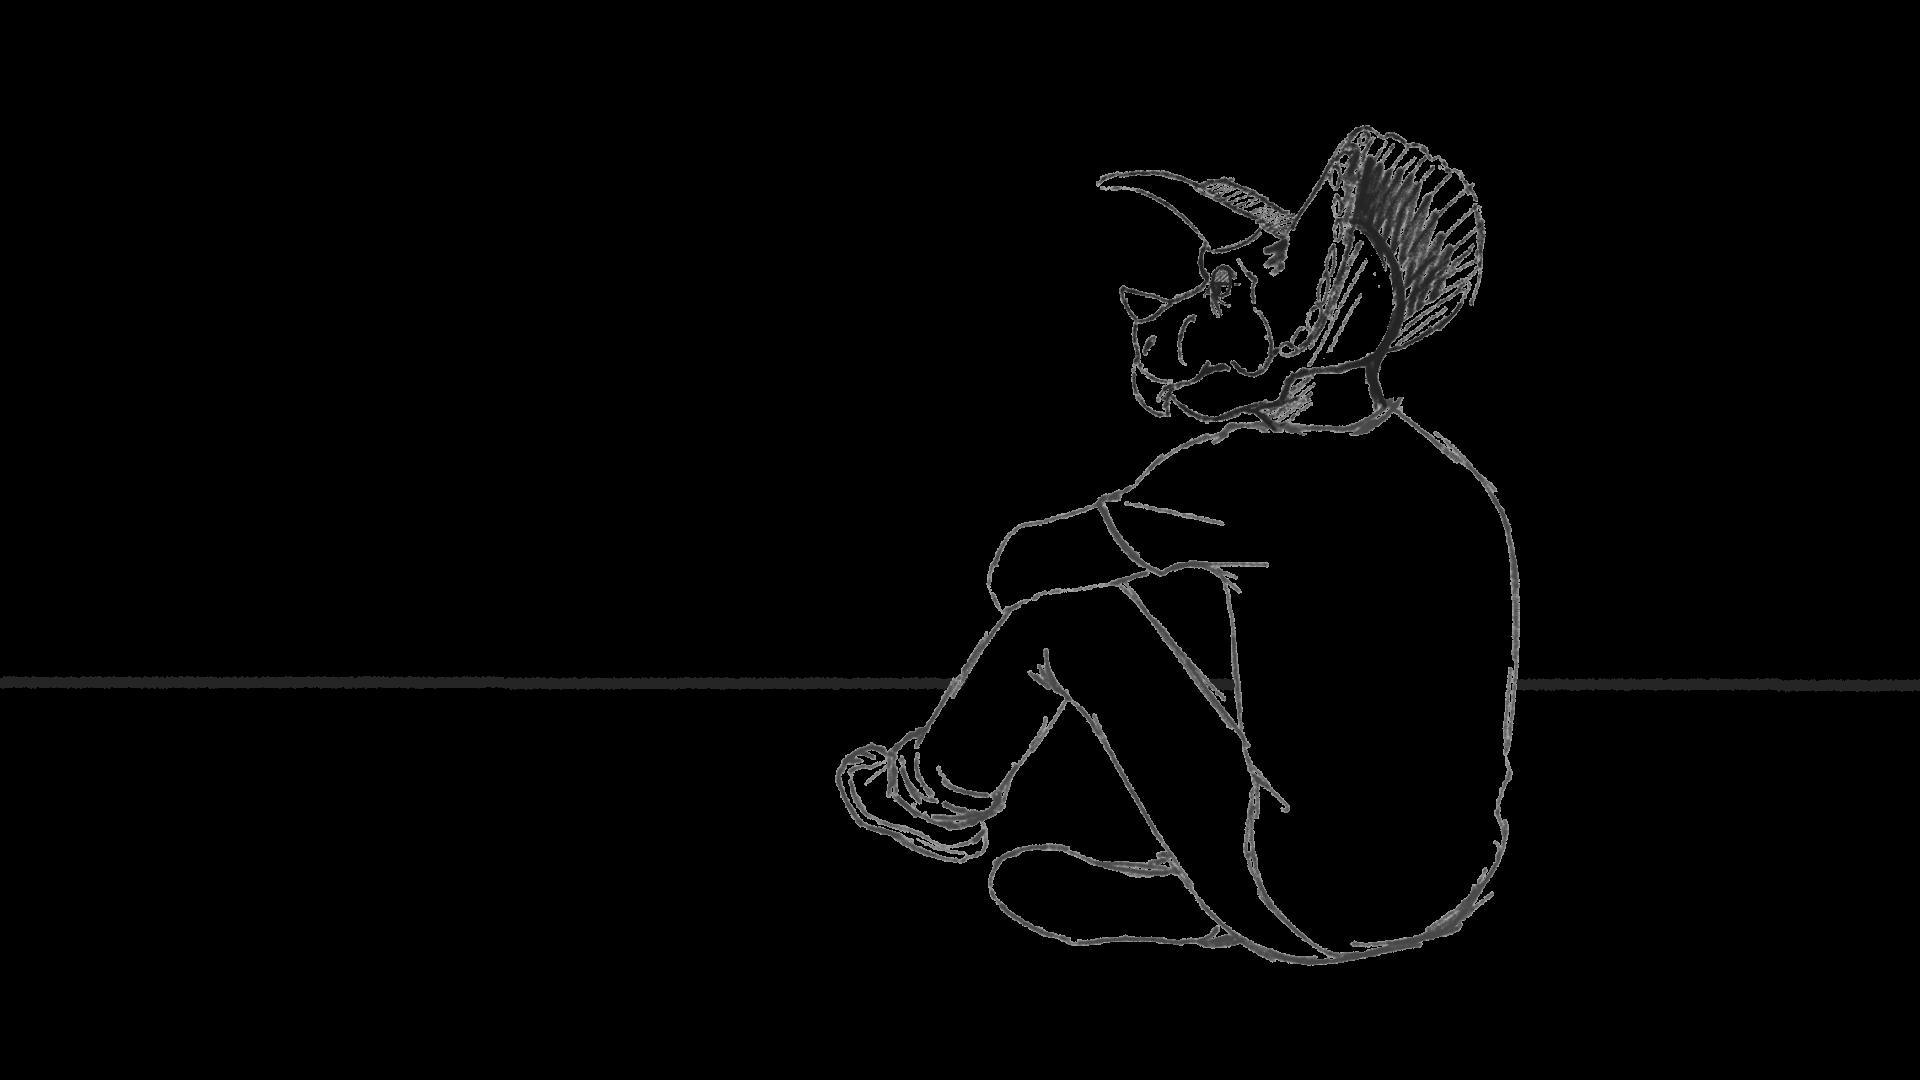 Tricera-dude Sketch